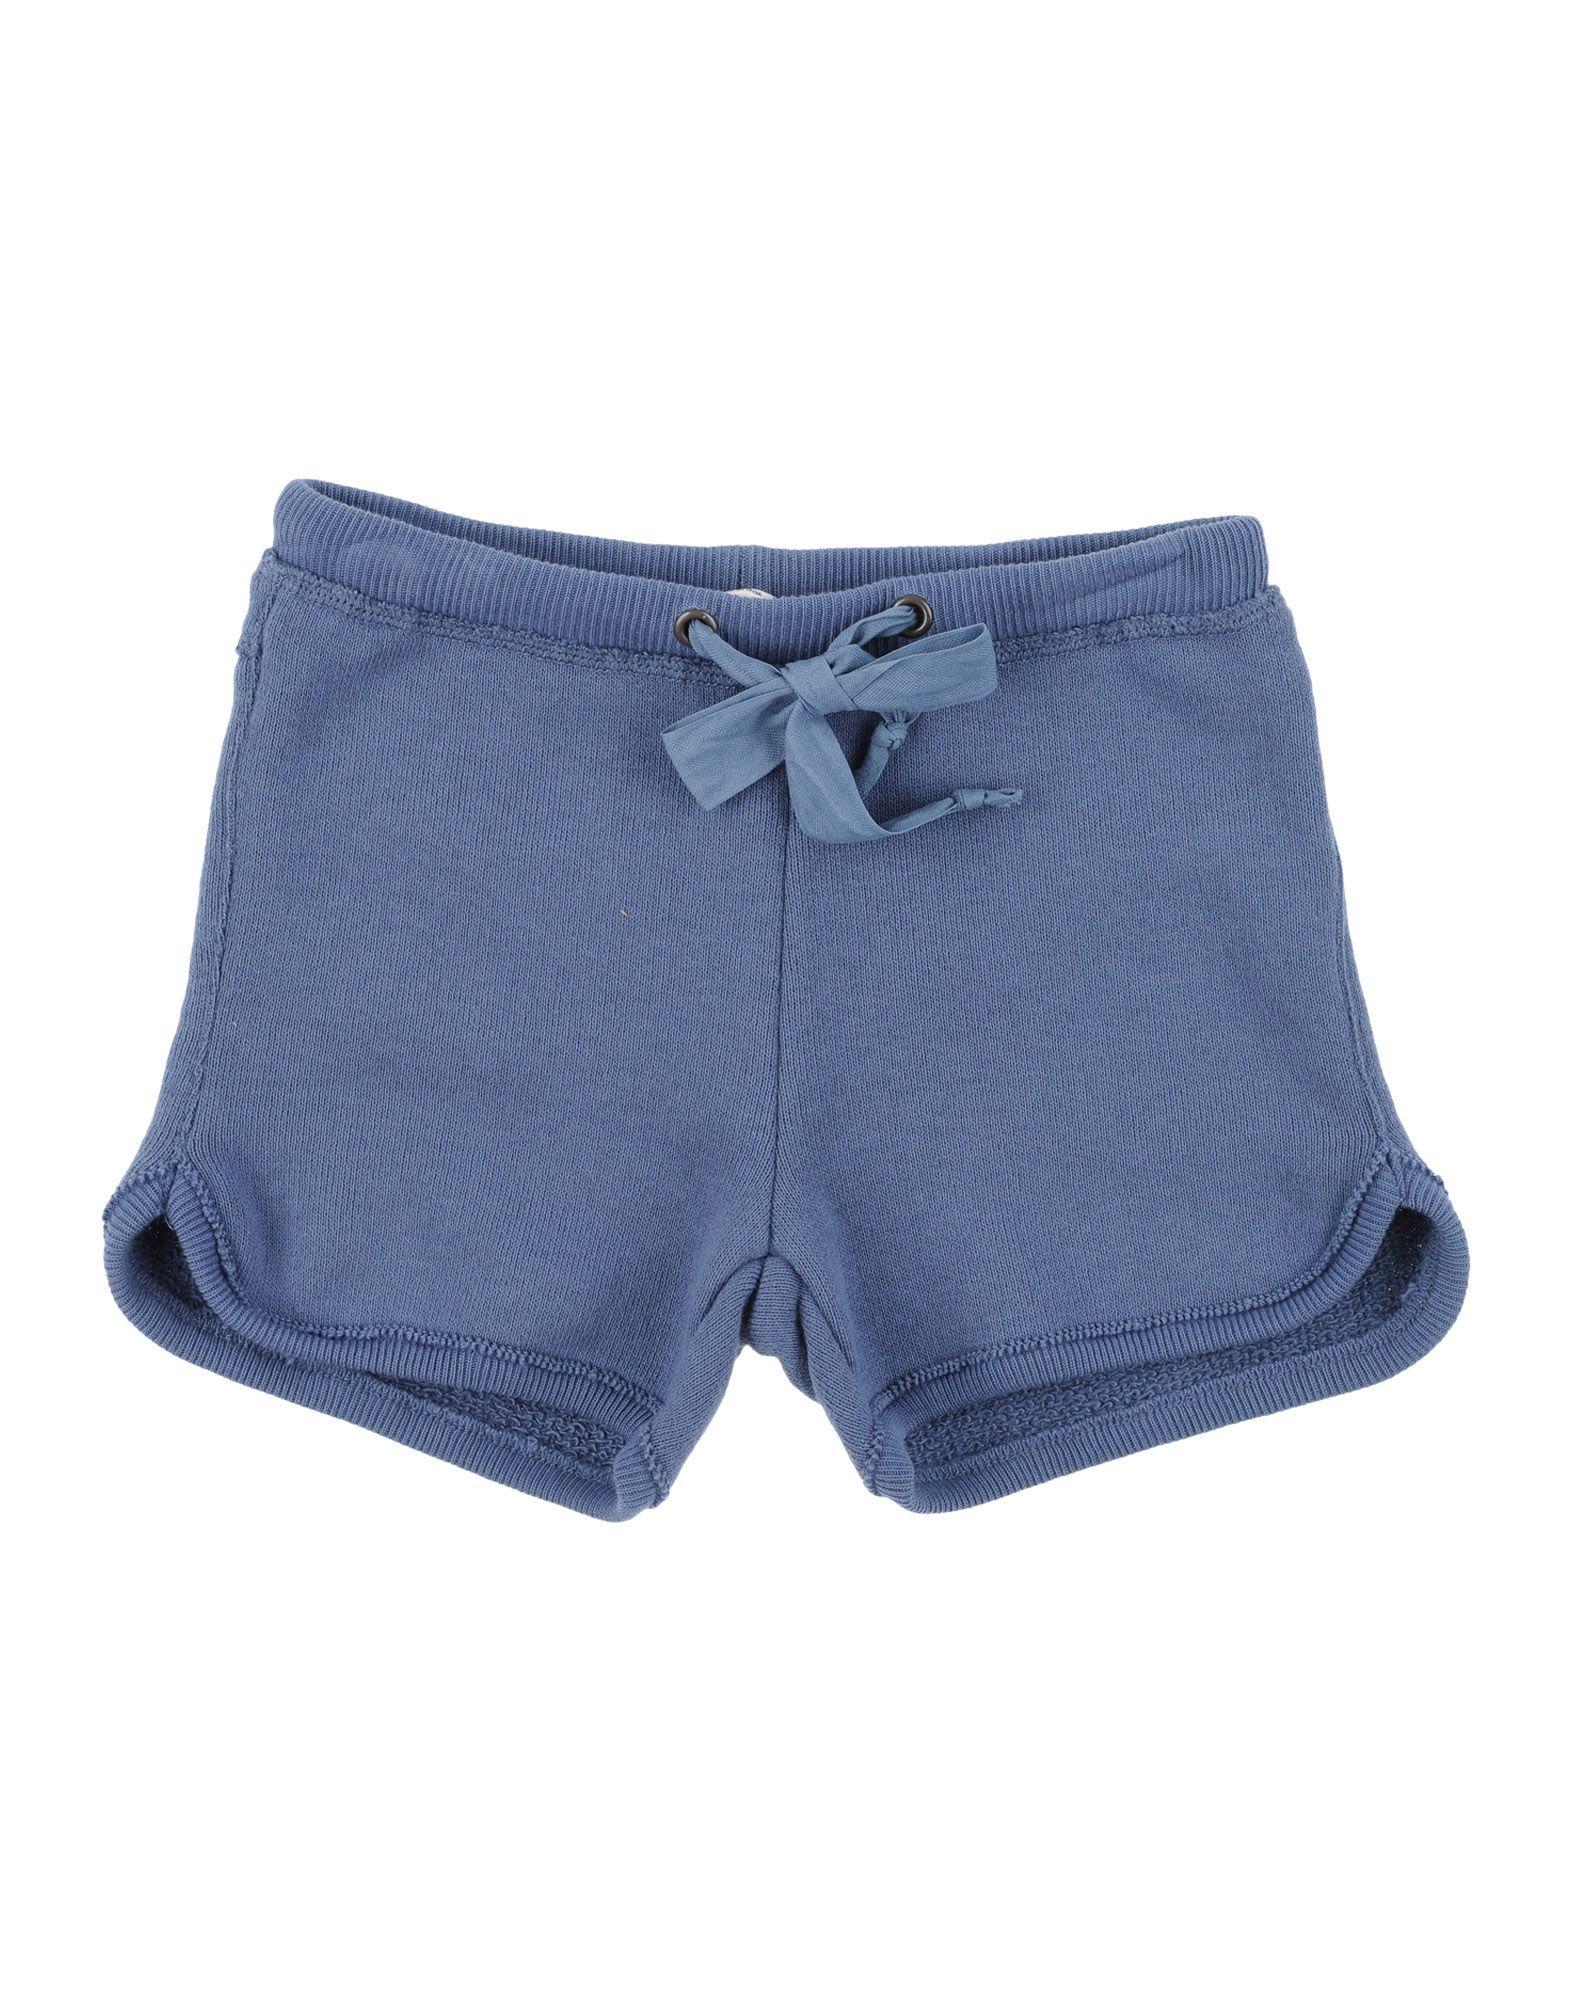 Babe & Tess Slate Blue Cotton Shorts